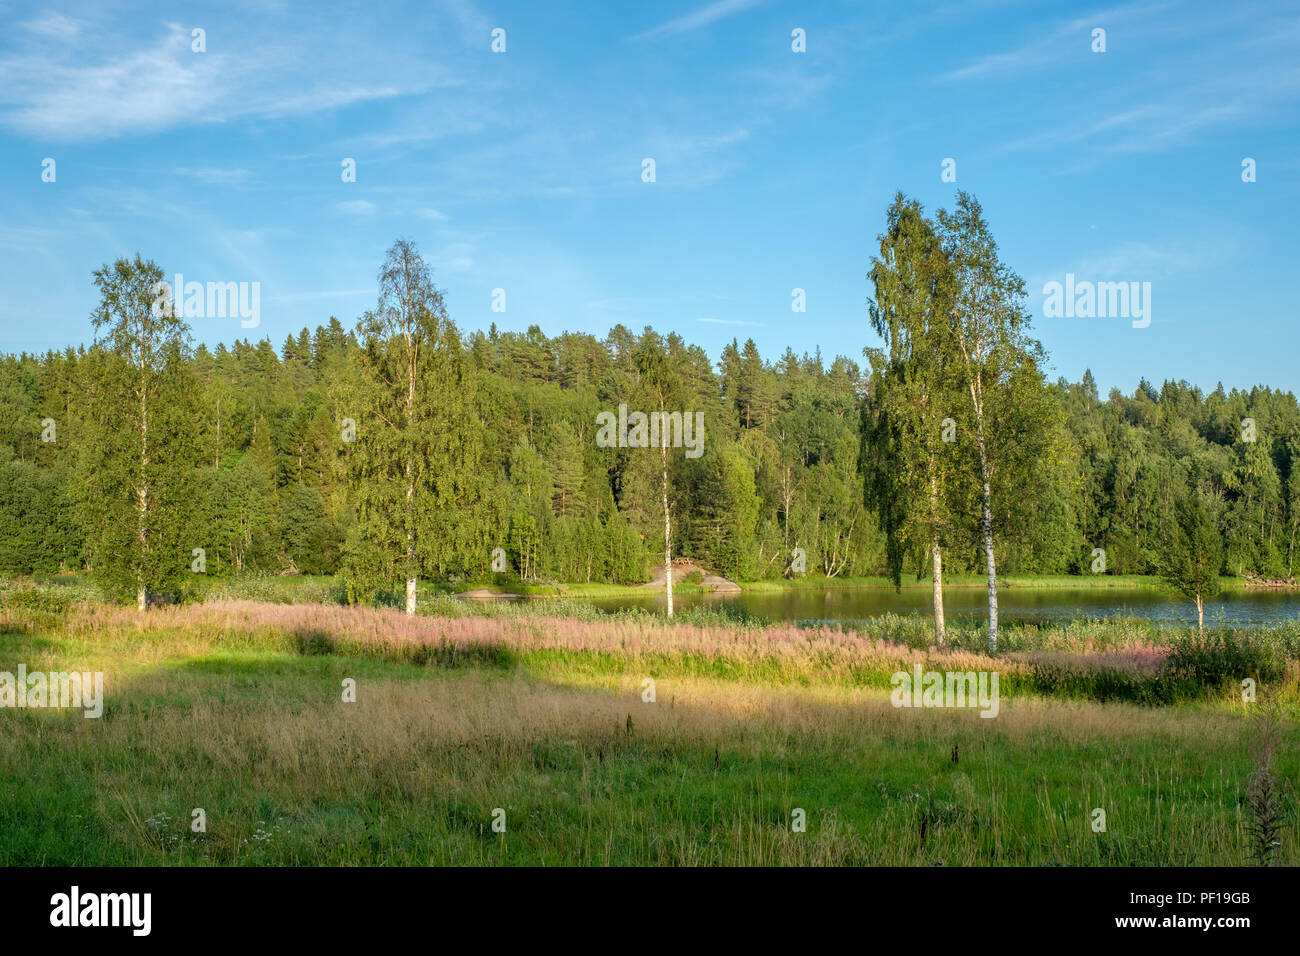 Summer evening by lake Gjardefjarden in Lovanger in northern Sweden. - Stock Image